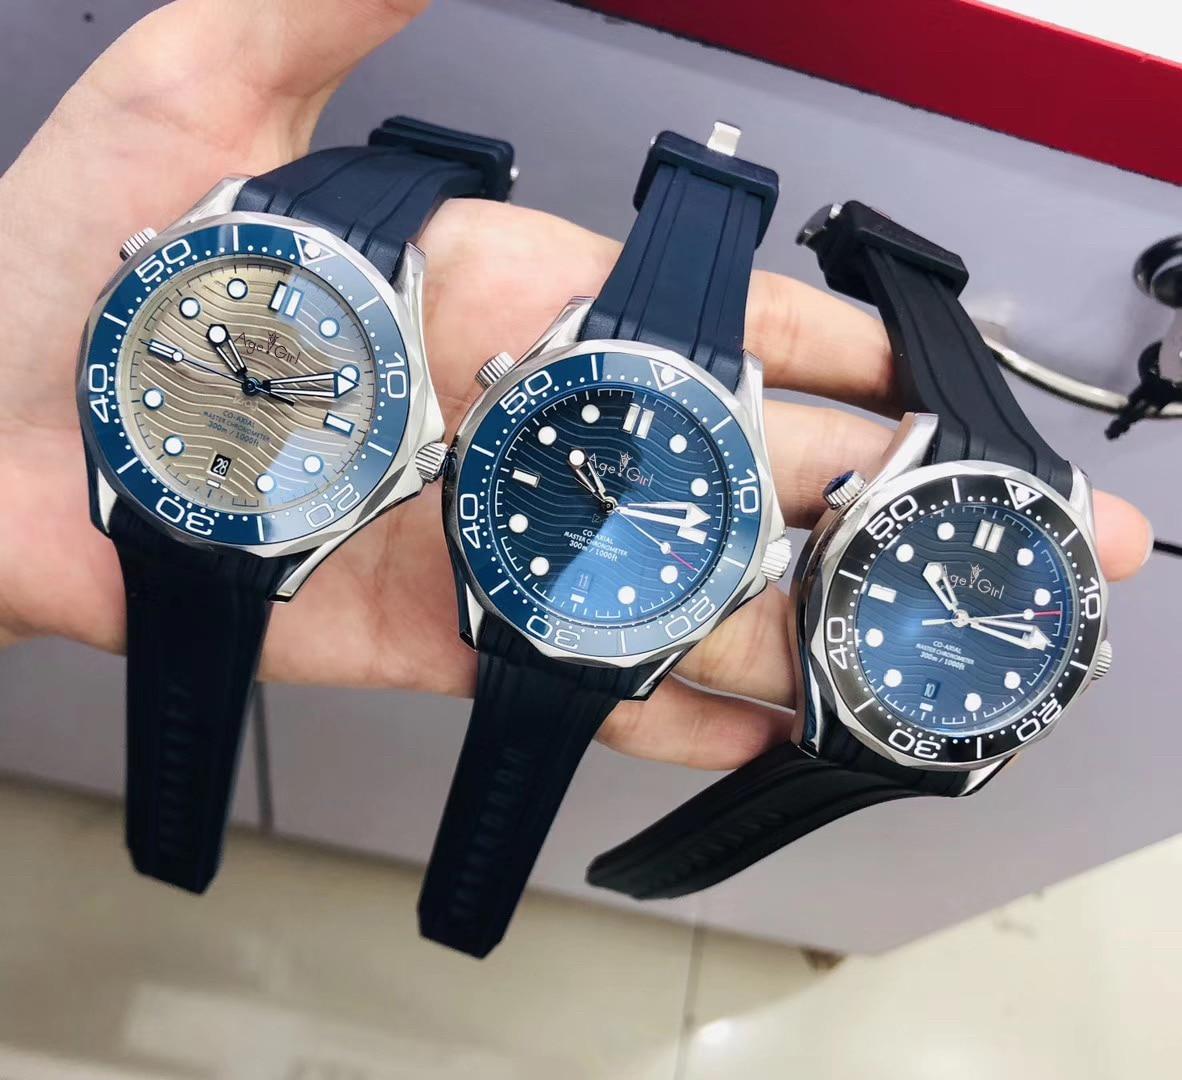 Reloj mecánico automático gris clásico nuevo para hombres, caucho negro azul, James Bond 007, cristal de zafiro de cerámica transparente en la parte trasera